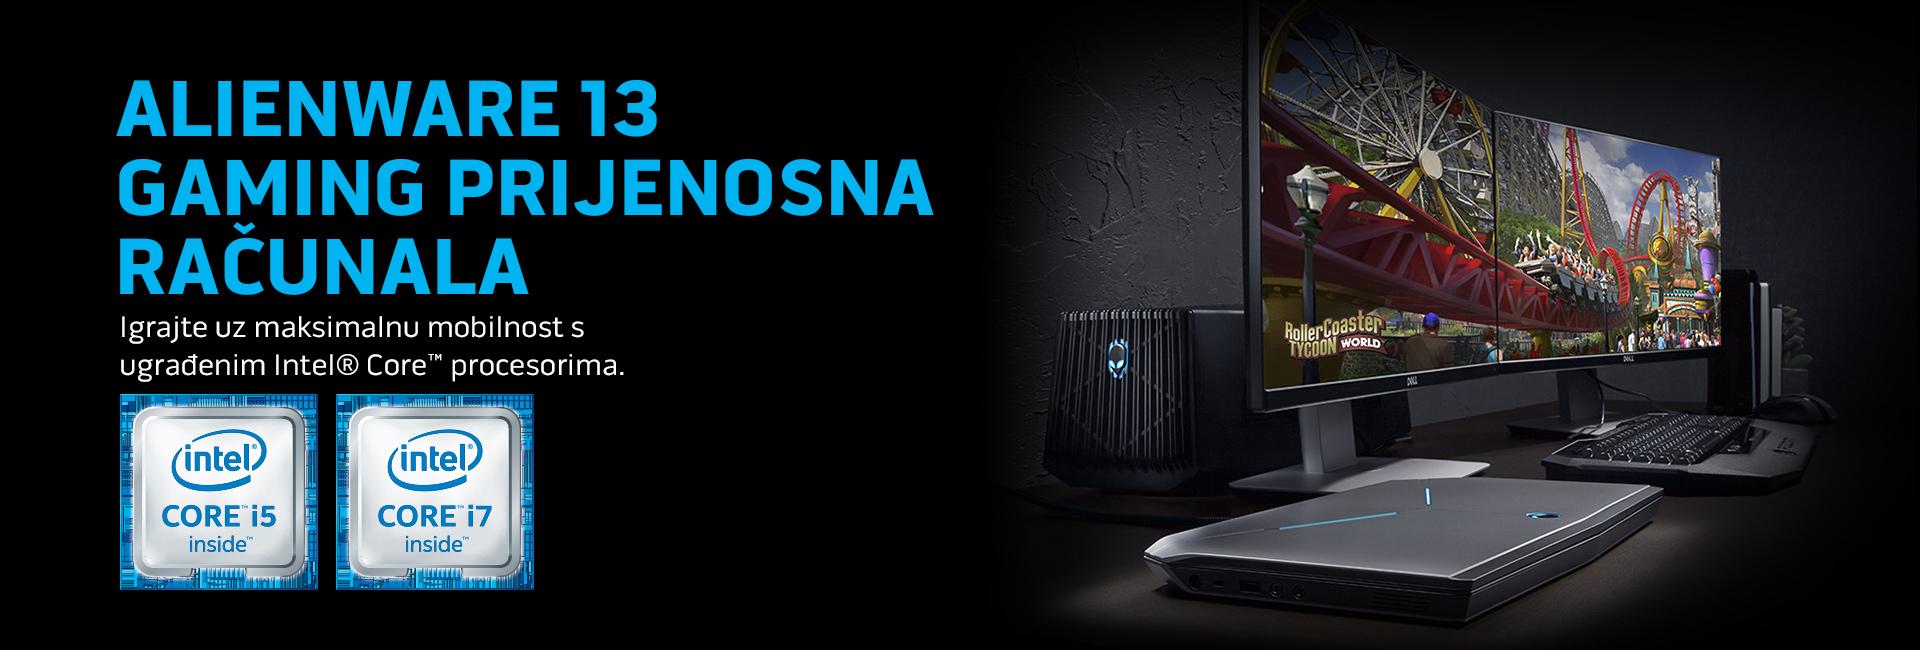 Alienware 13 gaming prijenosna računala